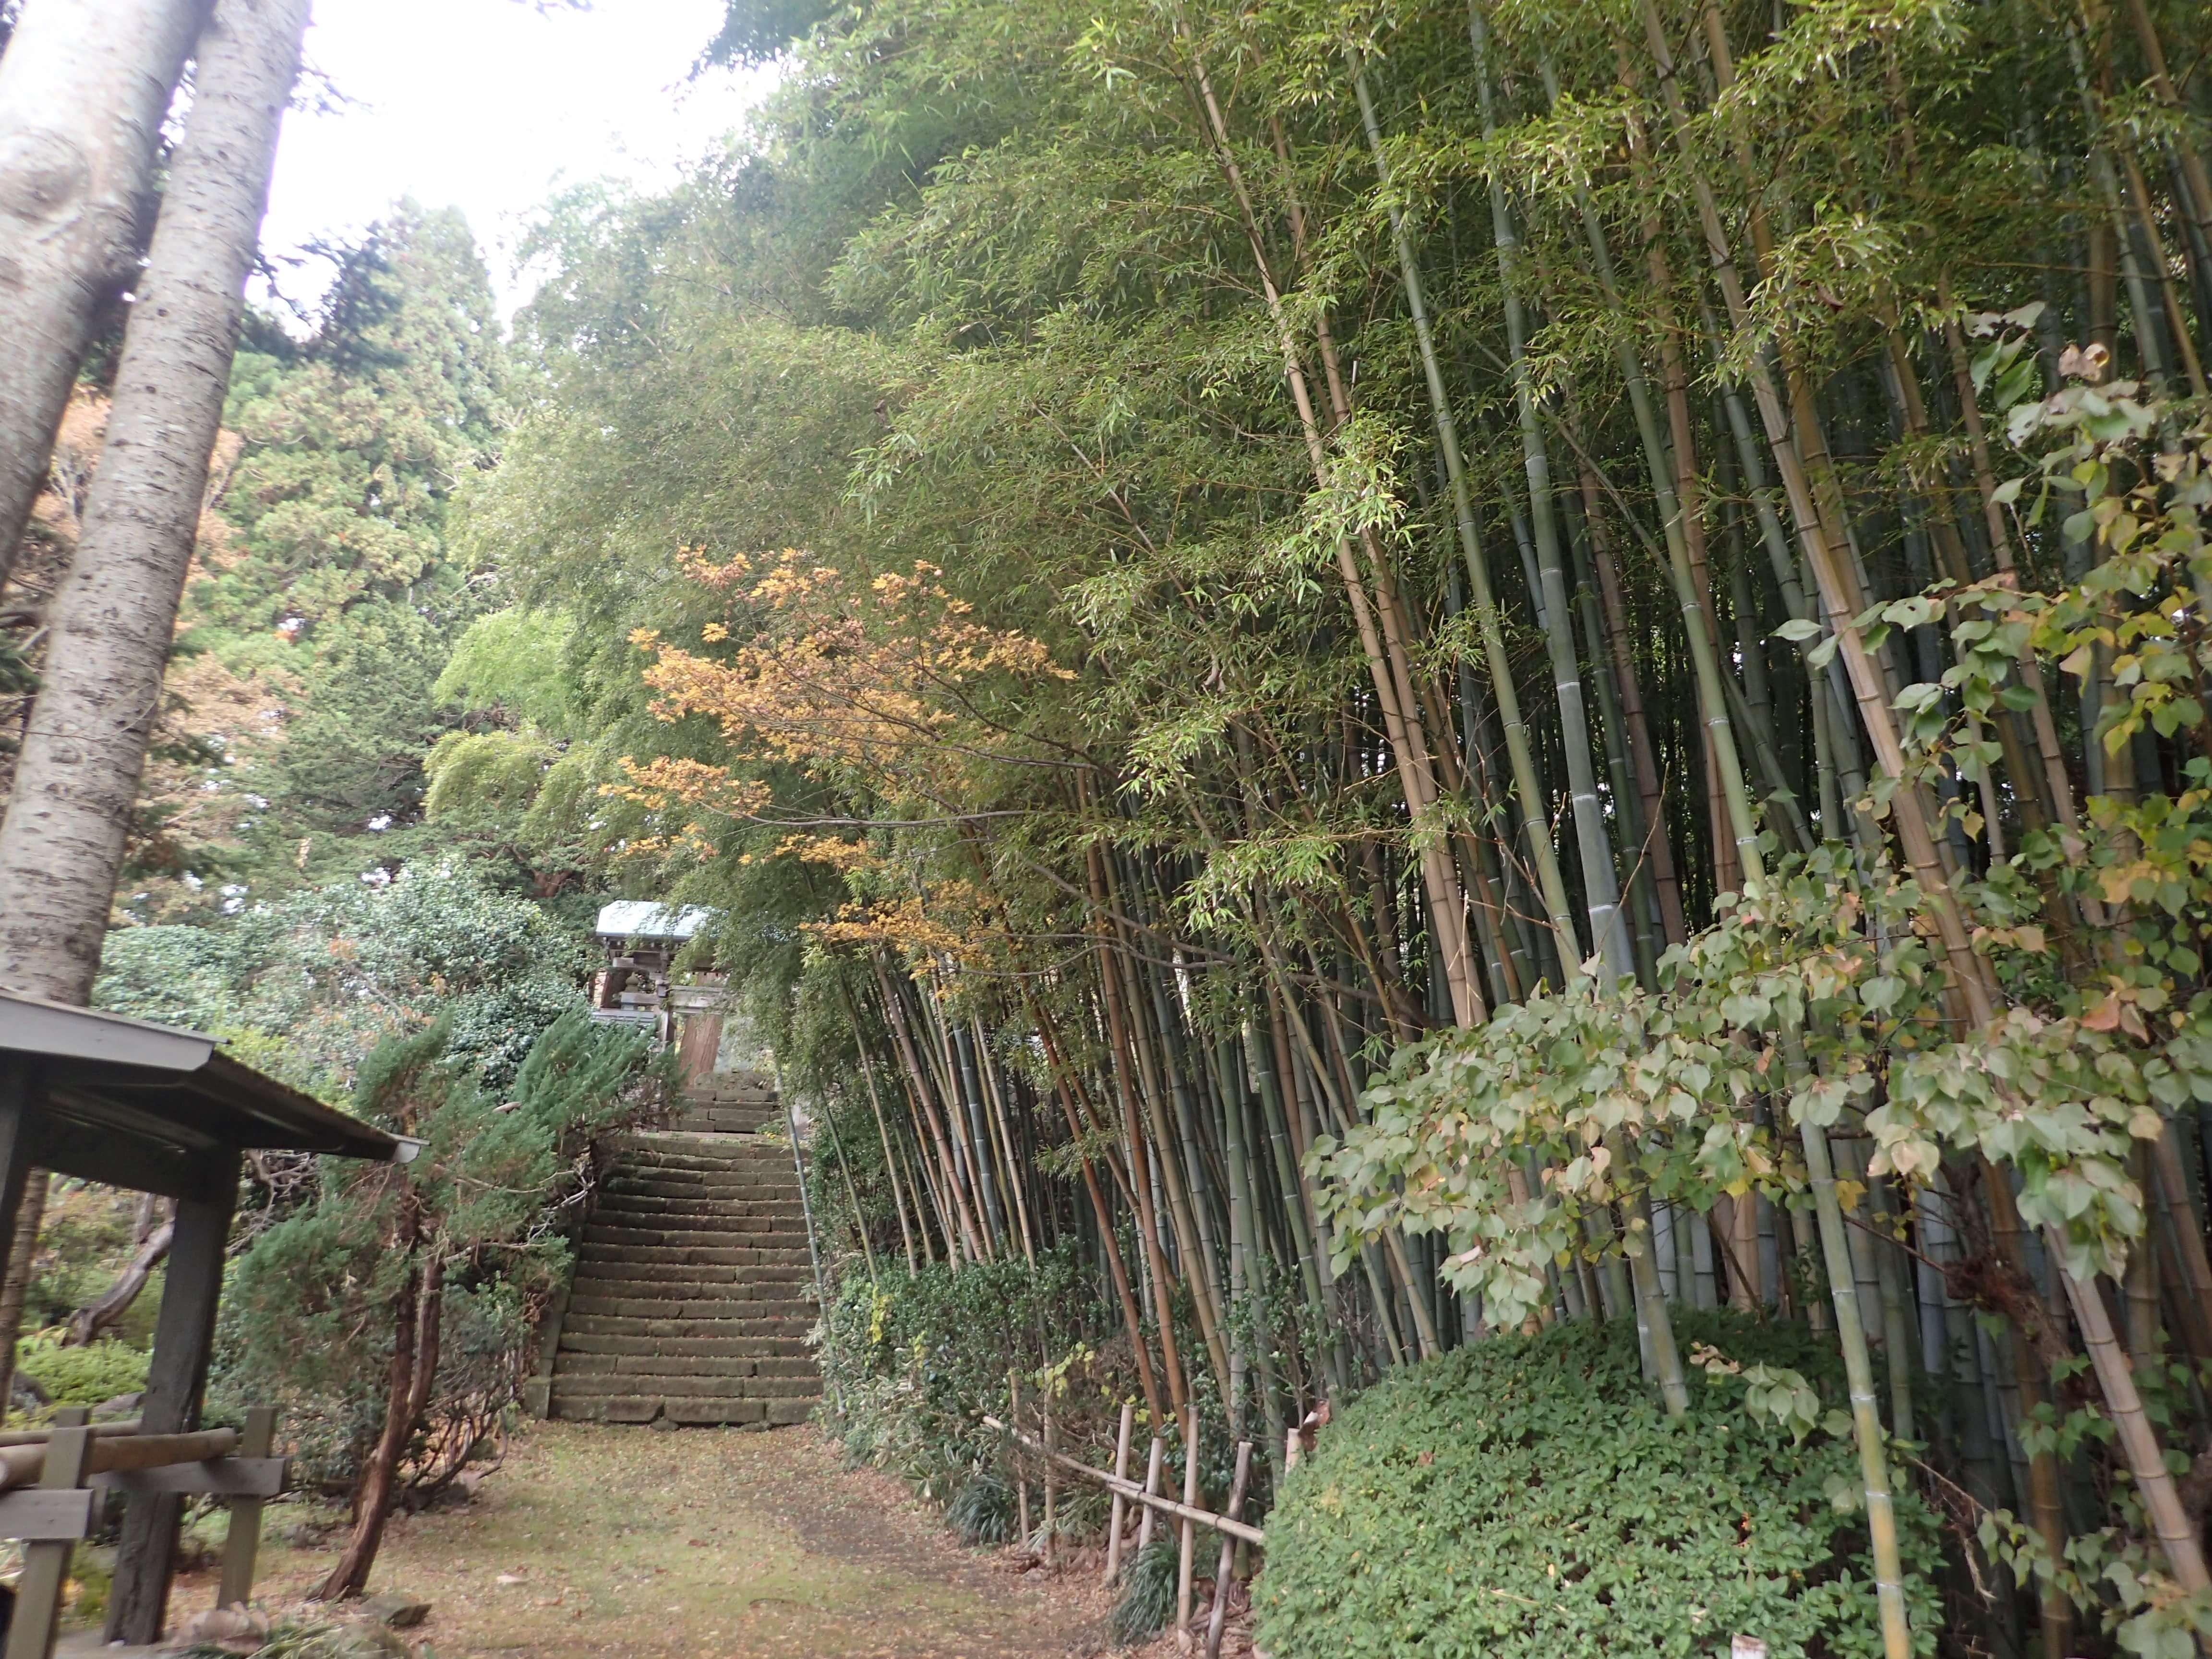 Image of 北海道松前町法幢寺での孟宗竹林での間伐等 1